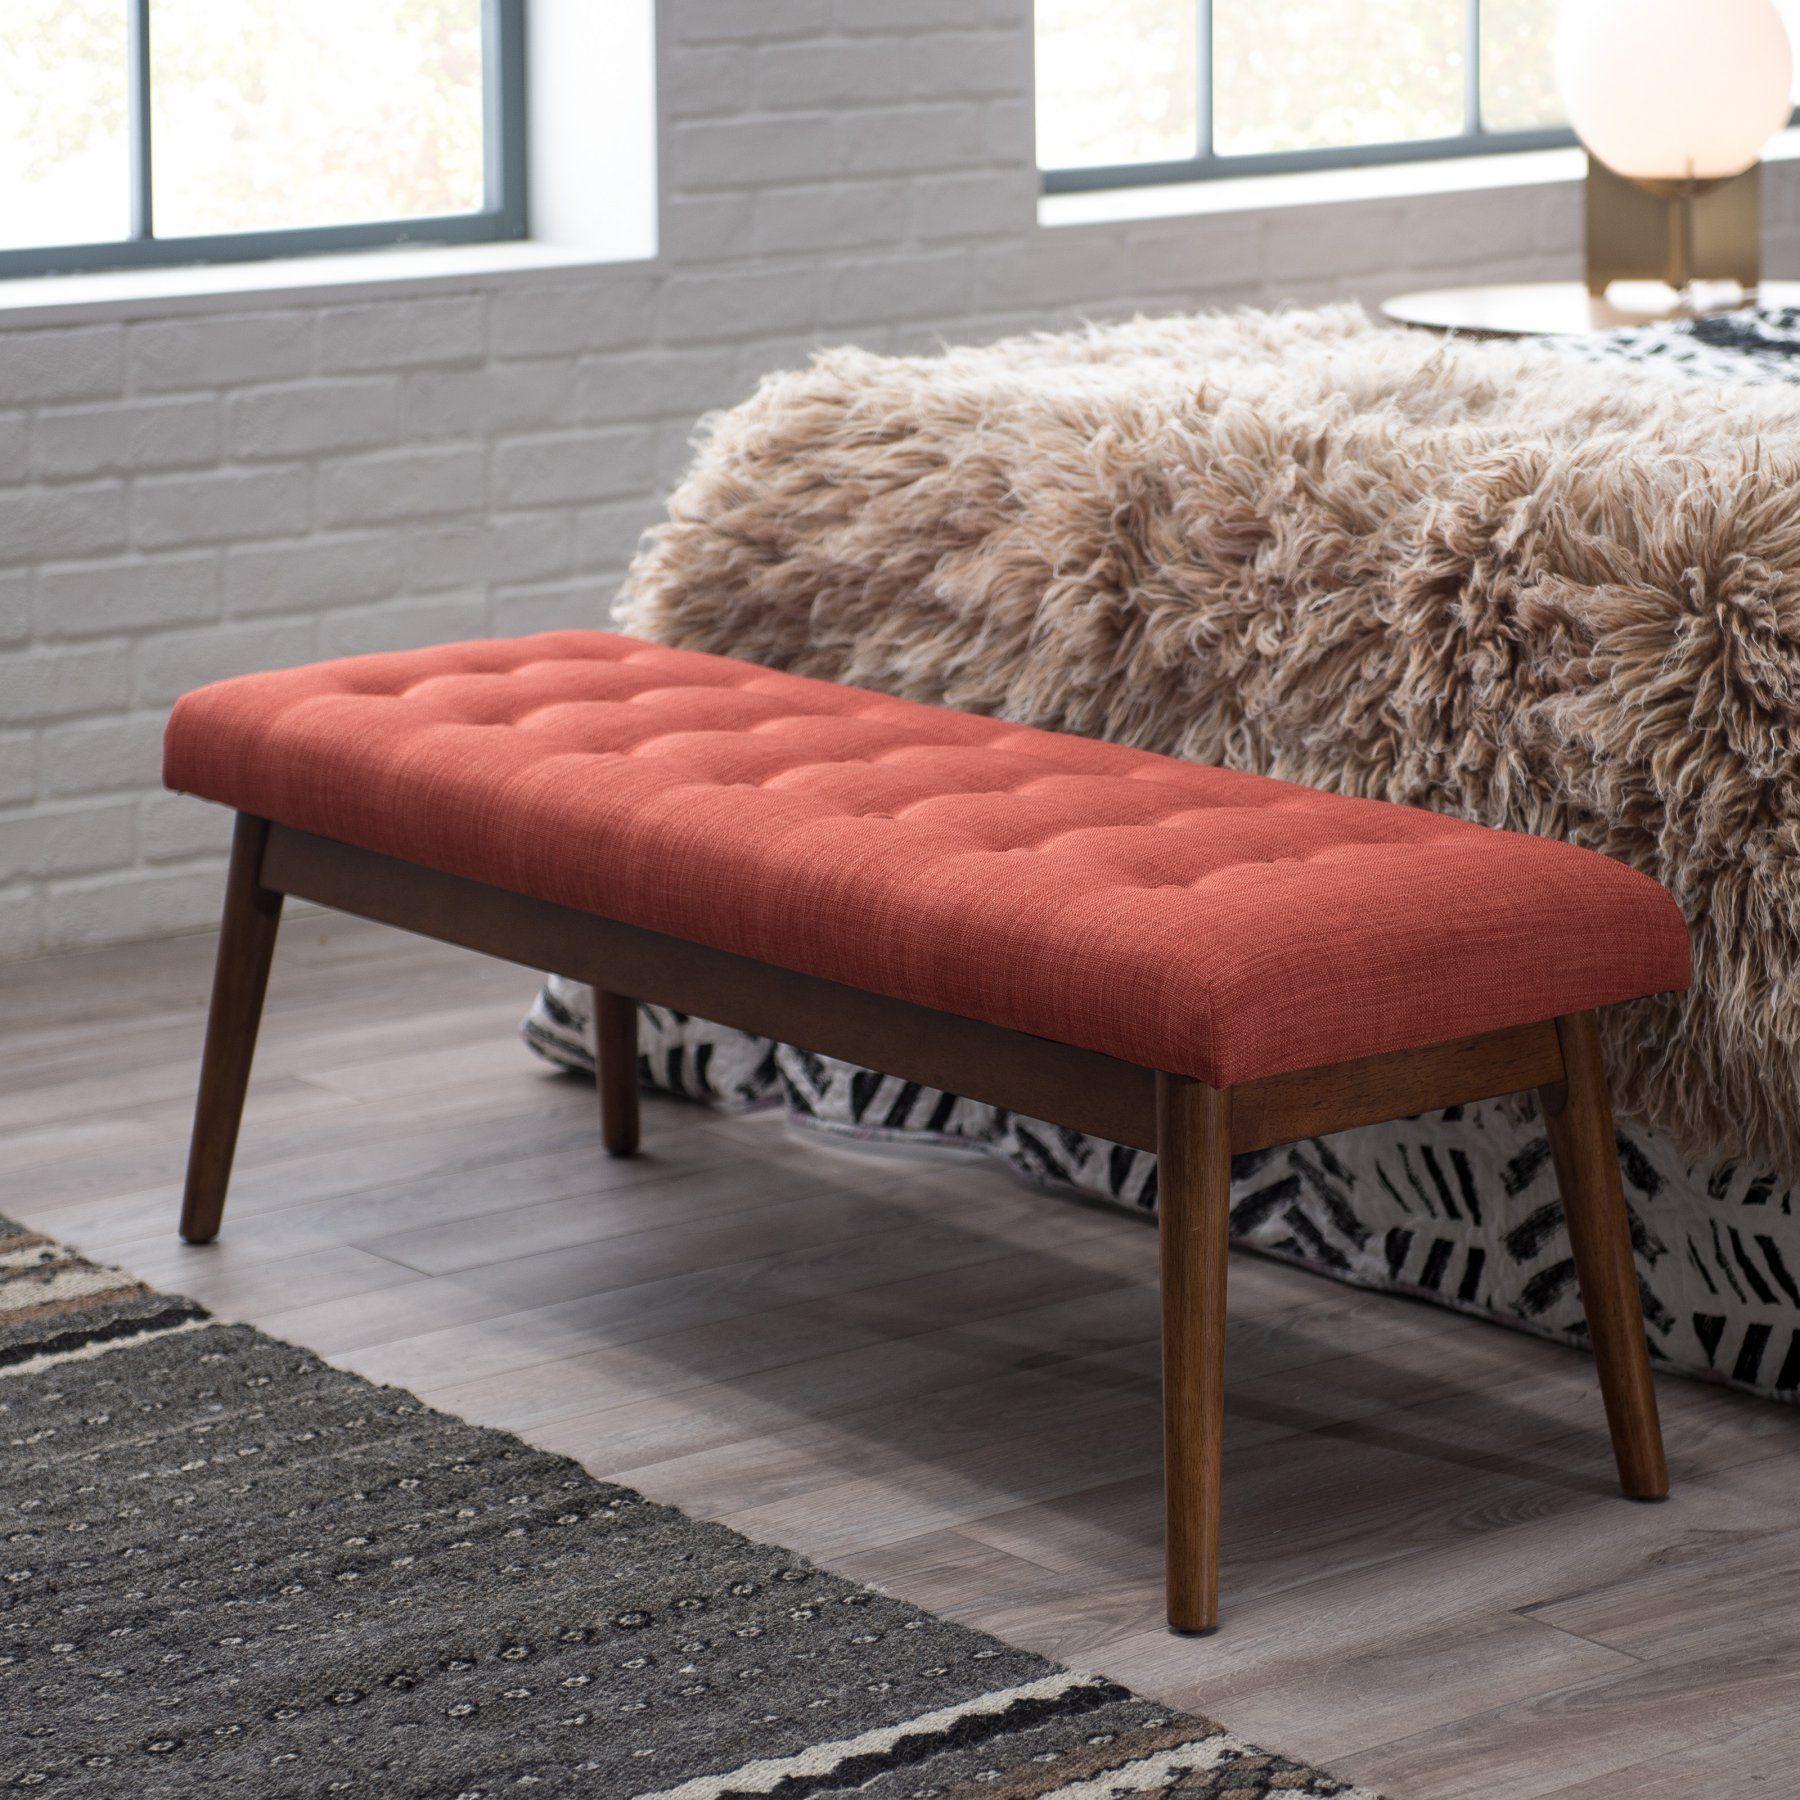 Superb Belham Living Darby Mid Century Modern Upholstered Bench Gamerscity Chair Design For Home Gamerscityorg